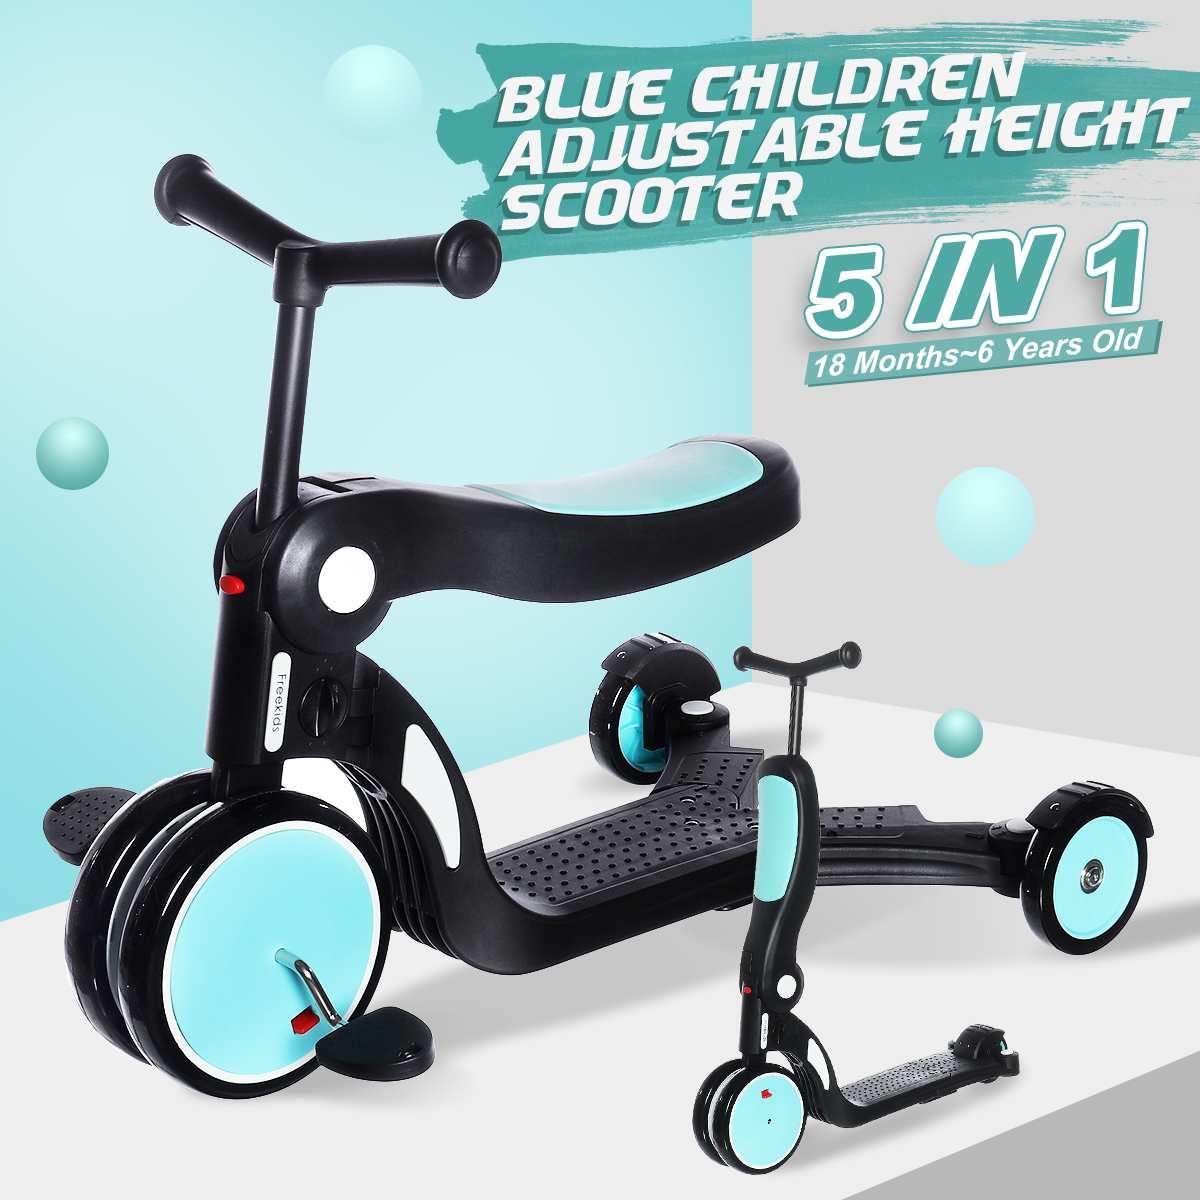 5 In 1 Children Scooter Skateboard 3 Wheel Infant Shining Scooter-Car Baby-Walker Kids Flashing Push Scooter